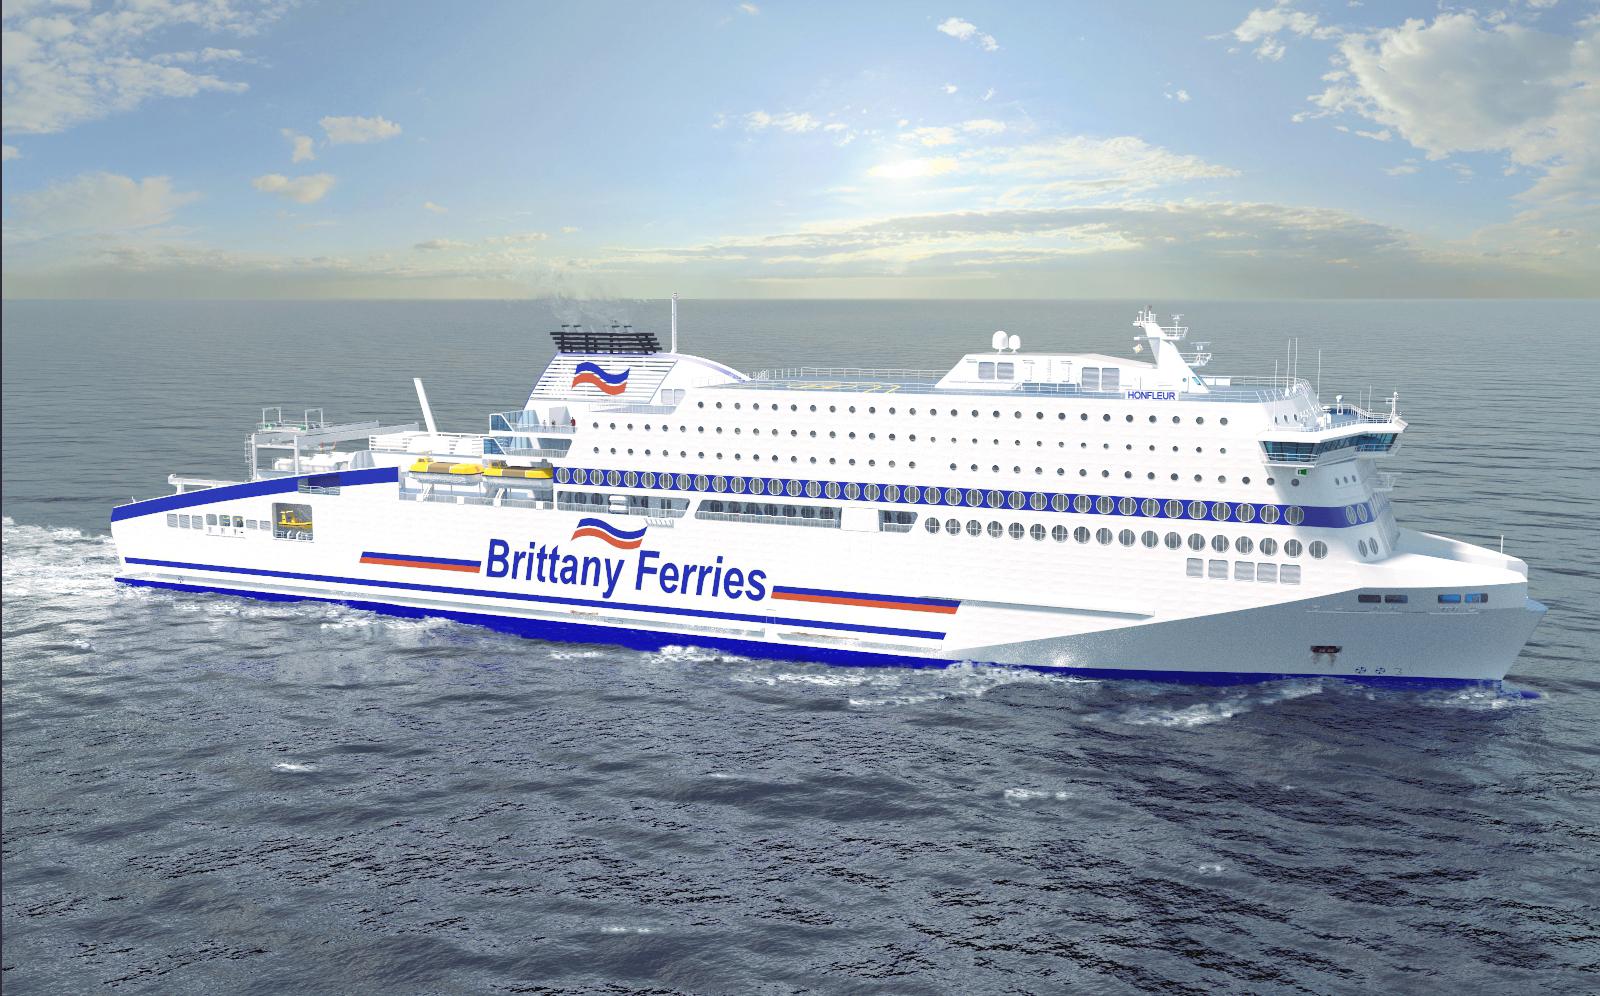 No Greener Fuel Storage In Ports Problem For Brittany Ferries Lng Engine System Diagram Honfleur Artists Impression